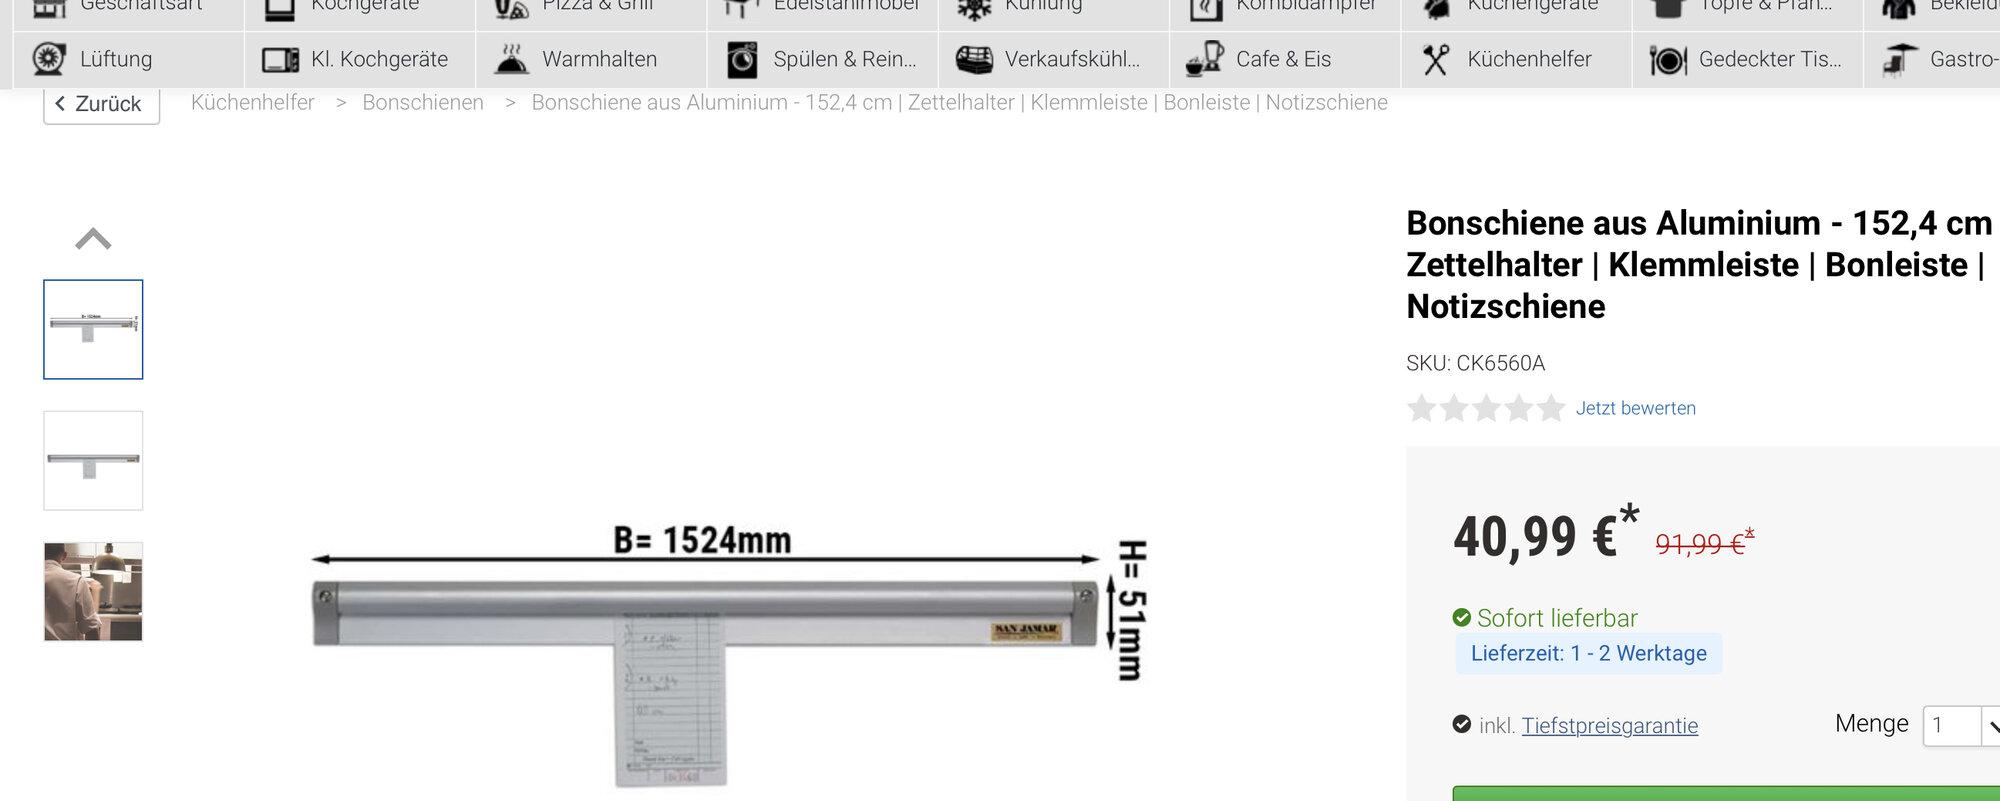 BF8CFA19-480B-473A-9022-9253E062D67D.jpeg